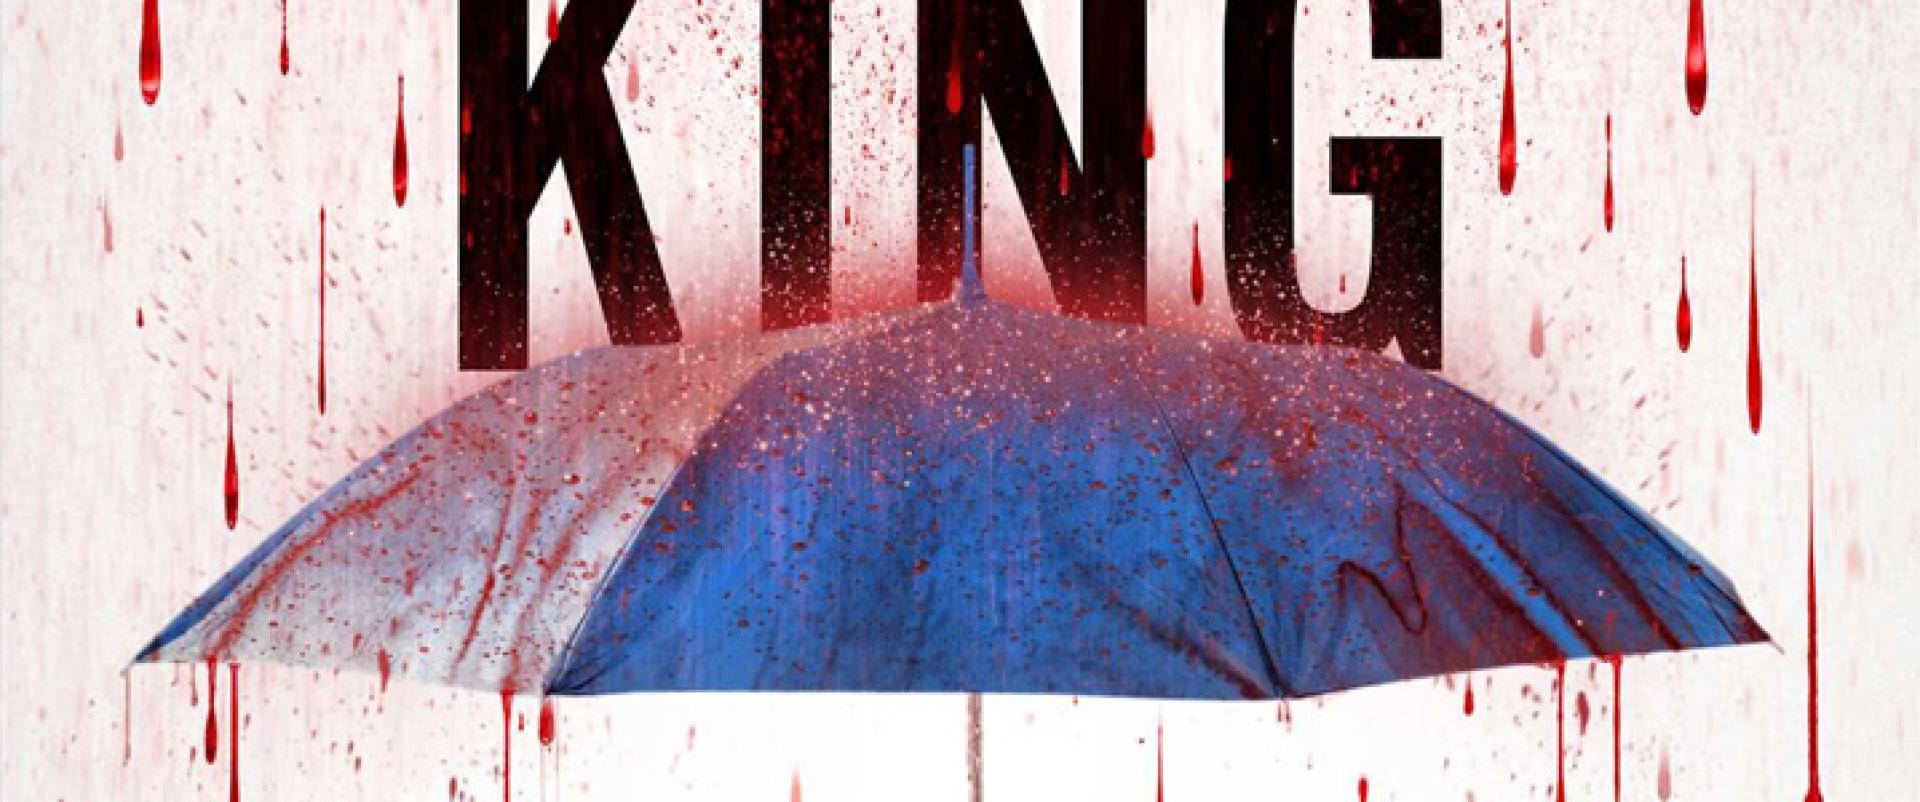 Stephen King: Mr. Mercedes (2014)